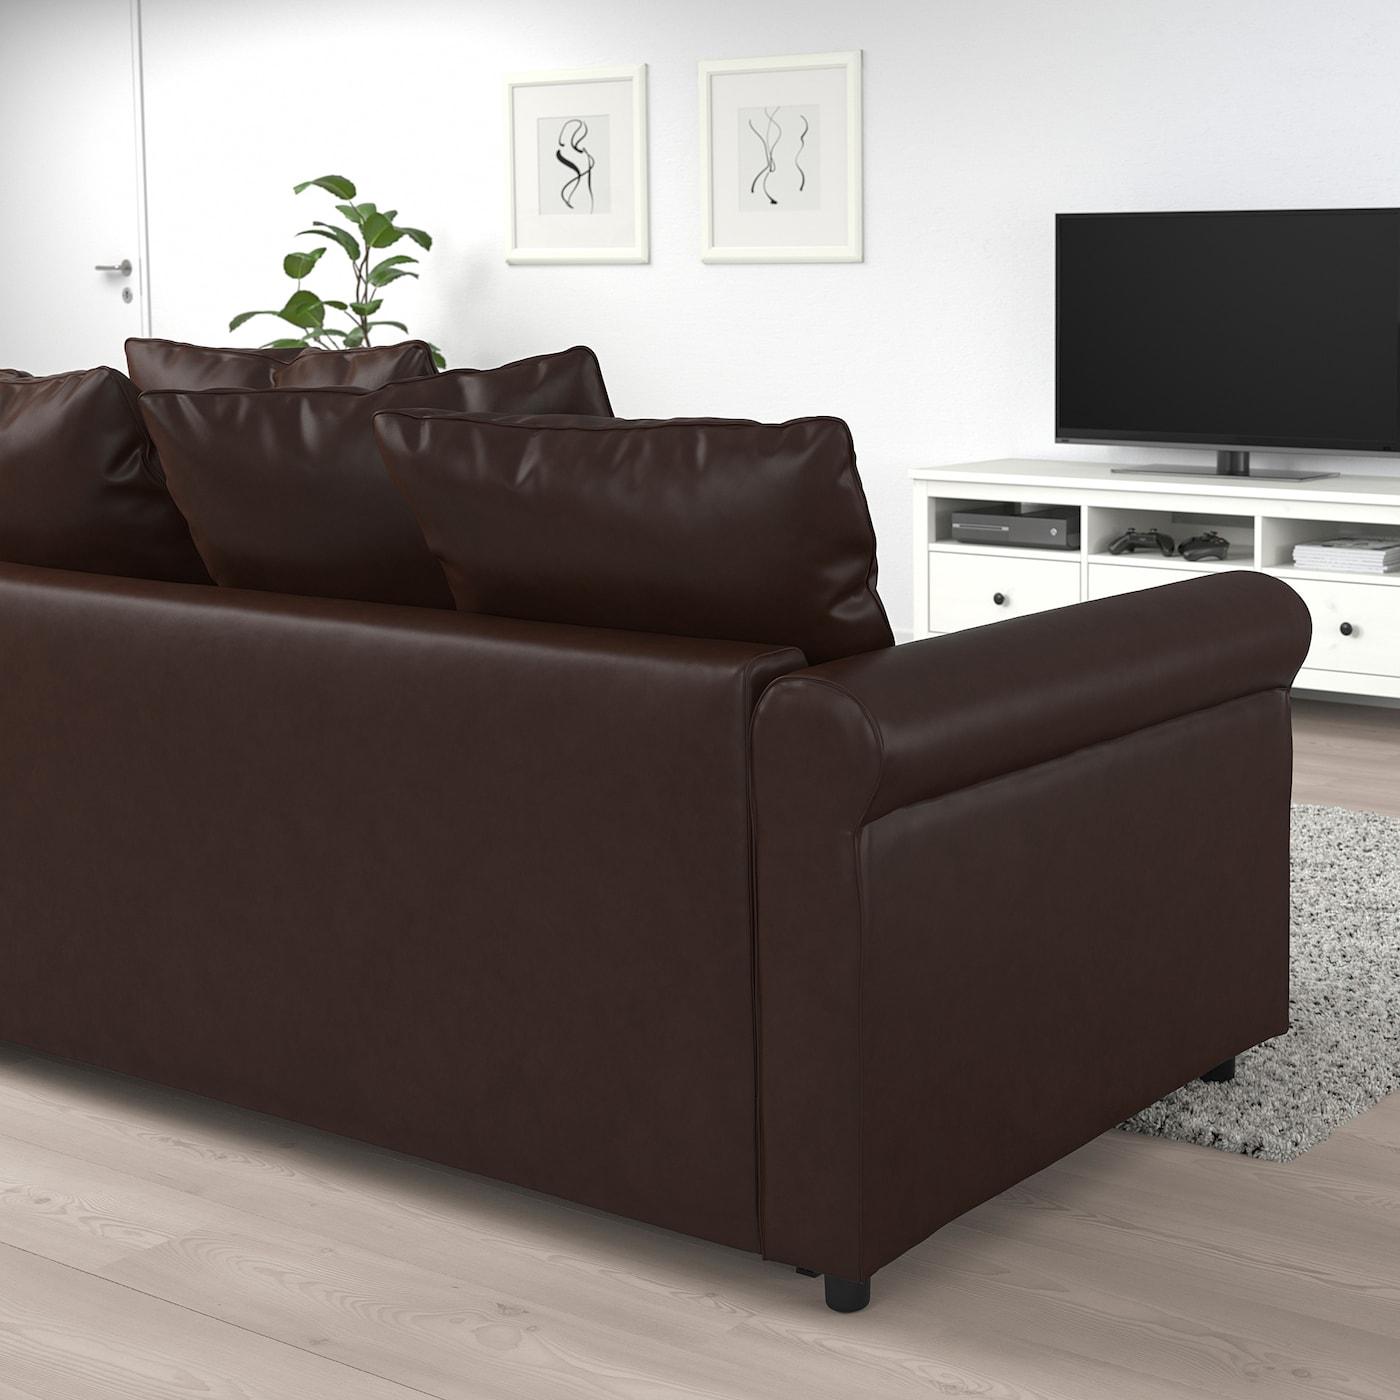 GrÖnlid Corner Sleeper Sofa 4 Seat